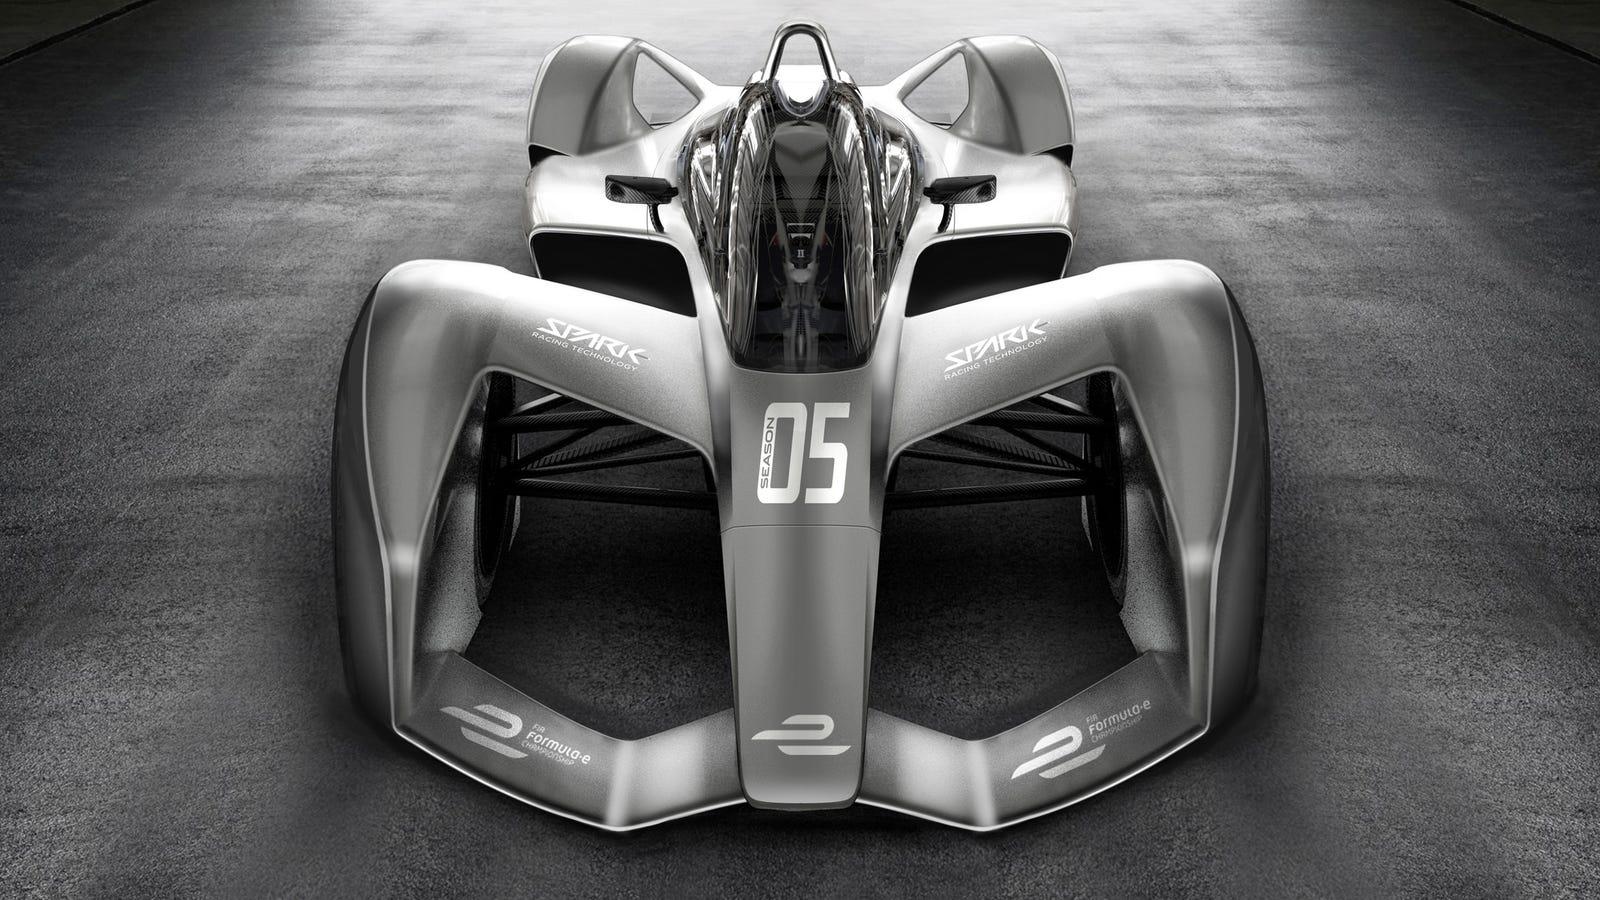 Formula e s next car looks insane